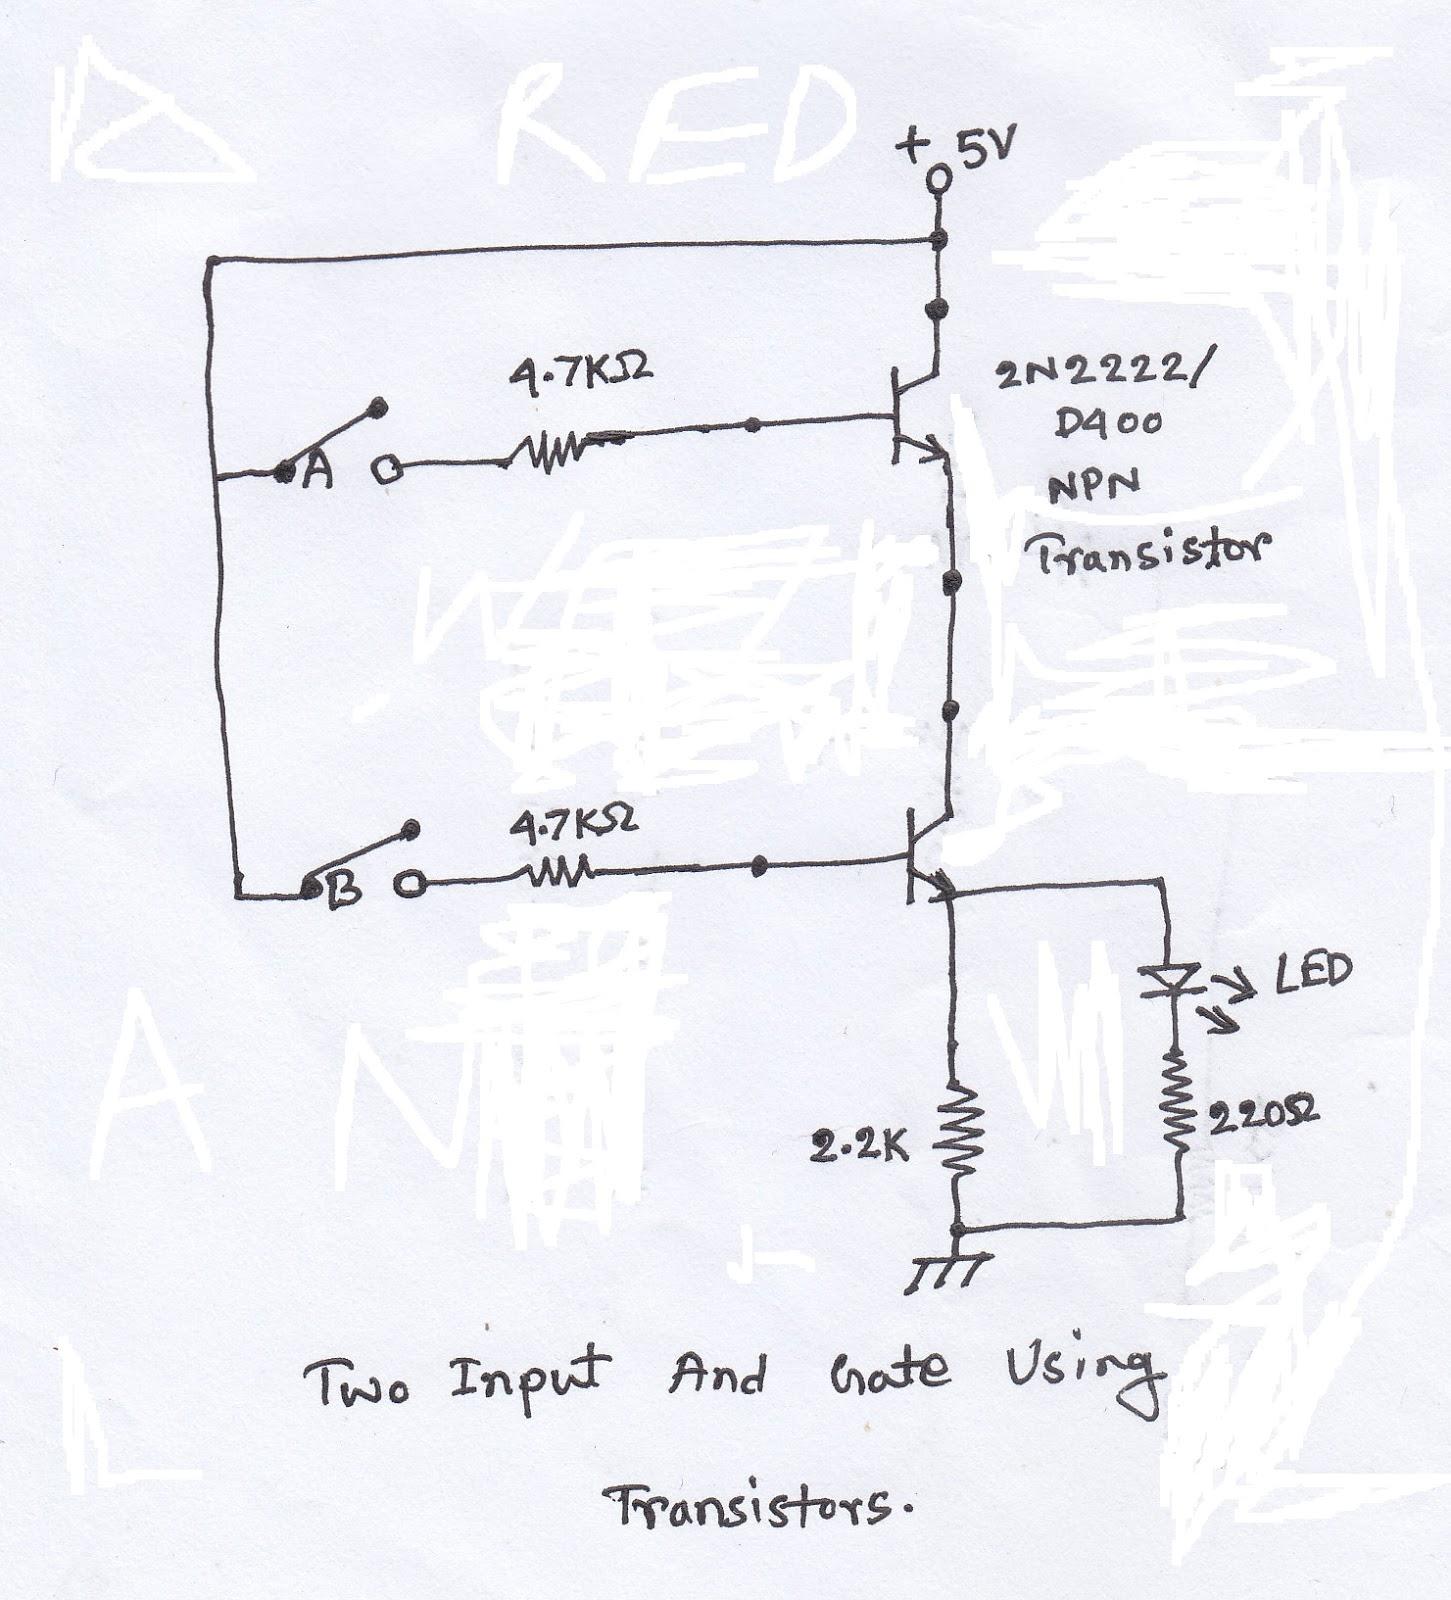 scavenger u0026 39 s blog  logic gates using transistor 1 and gate